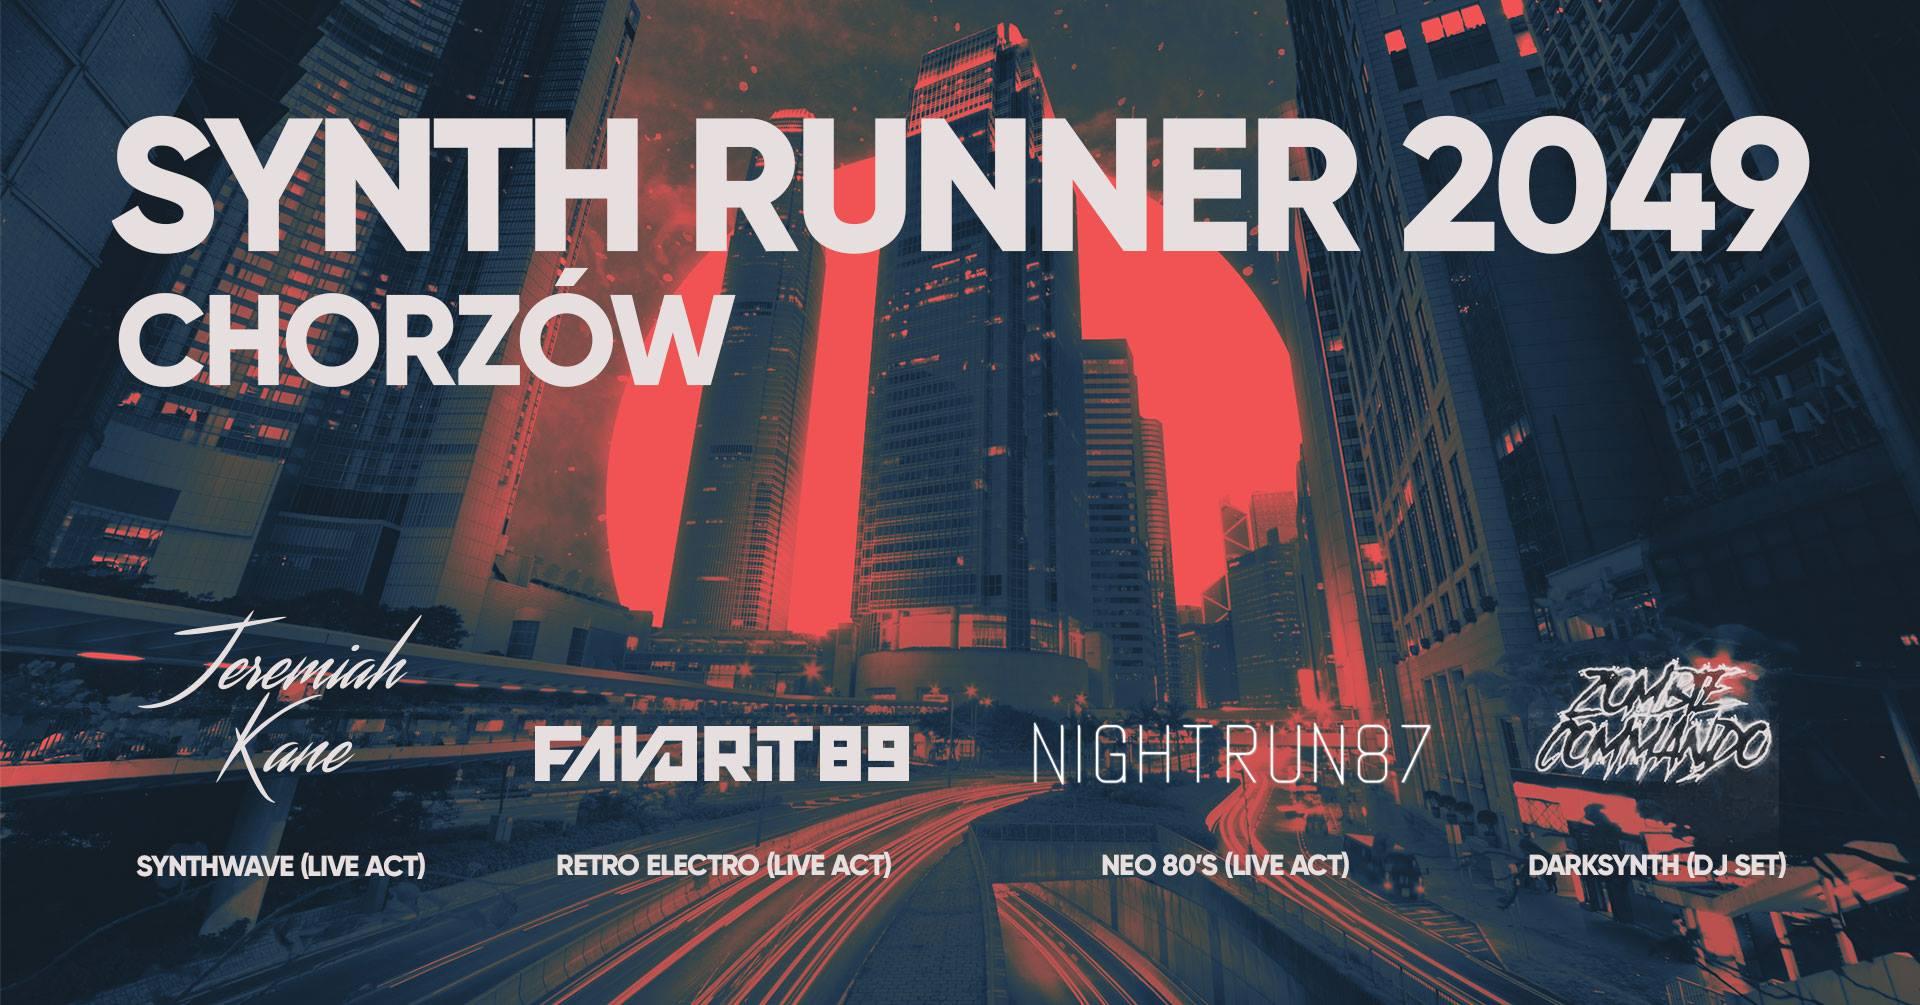 SynthRunner 2049 (Red&Black - Chorzów - 06.04.2018)